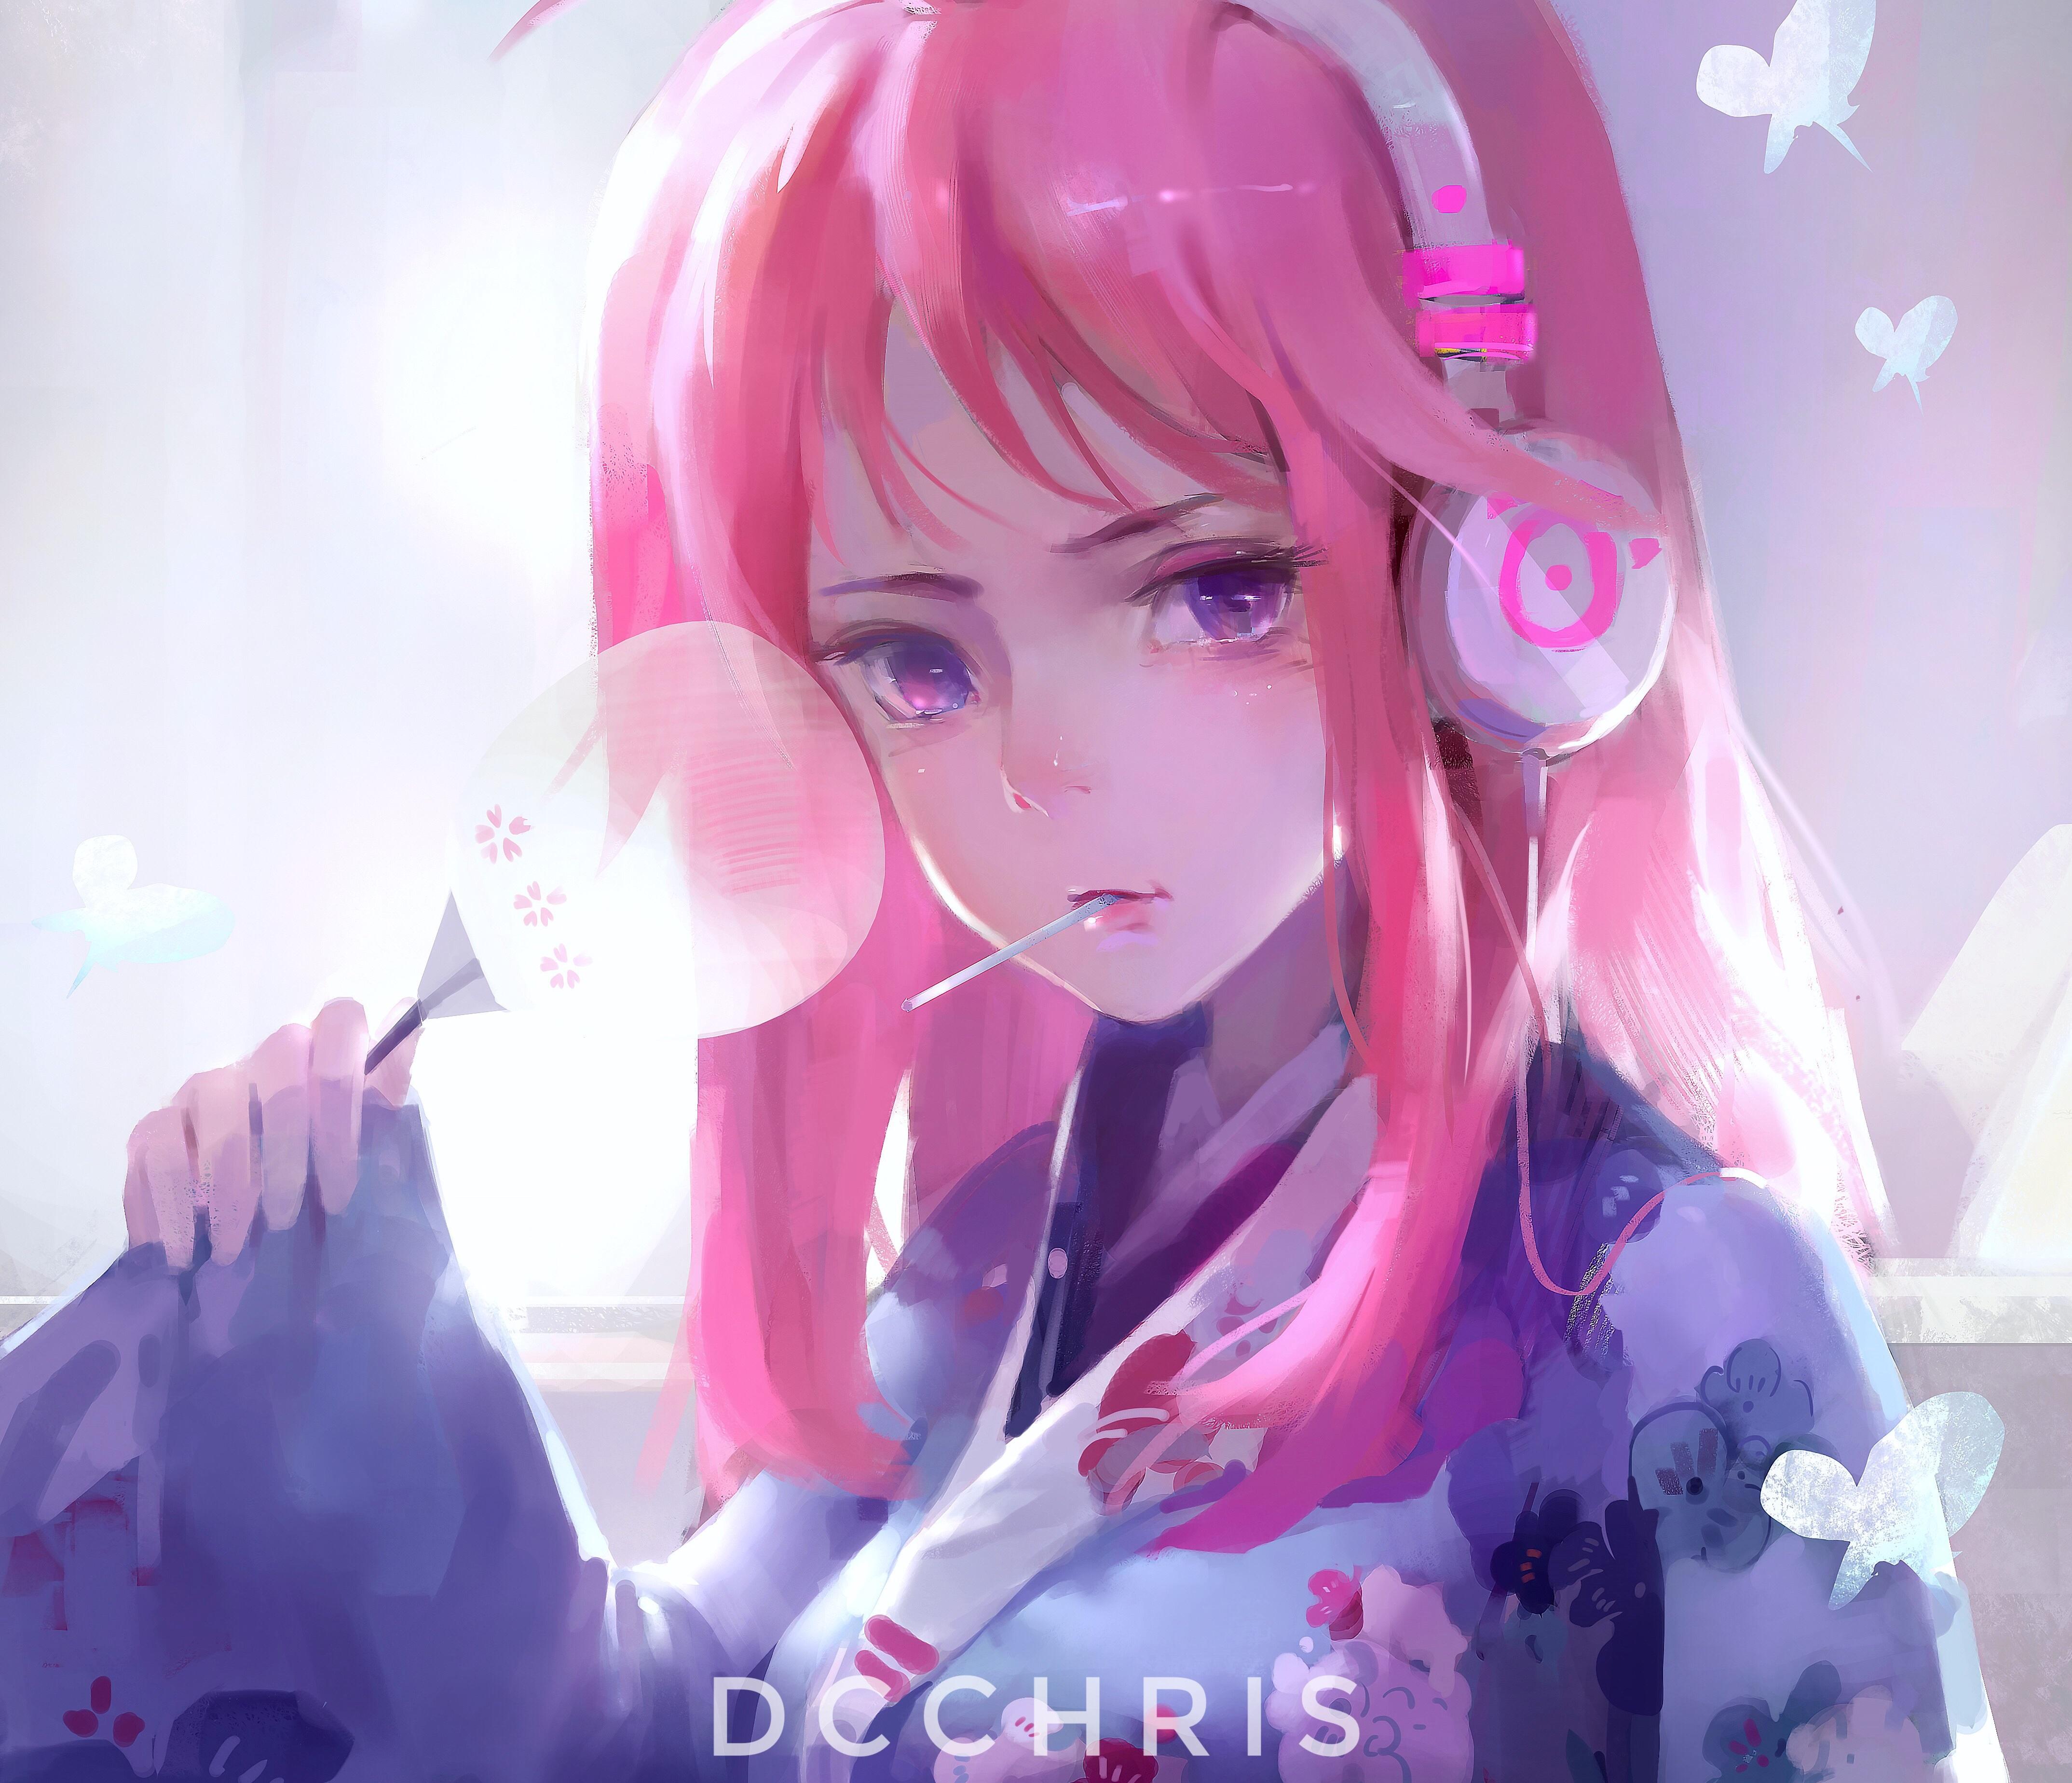 Wallpaper : anime girls, pink hair, headphones 10x10